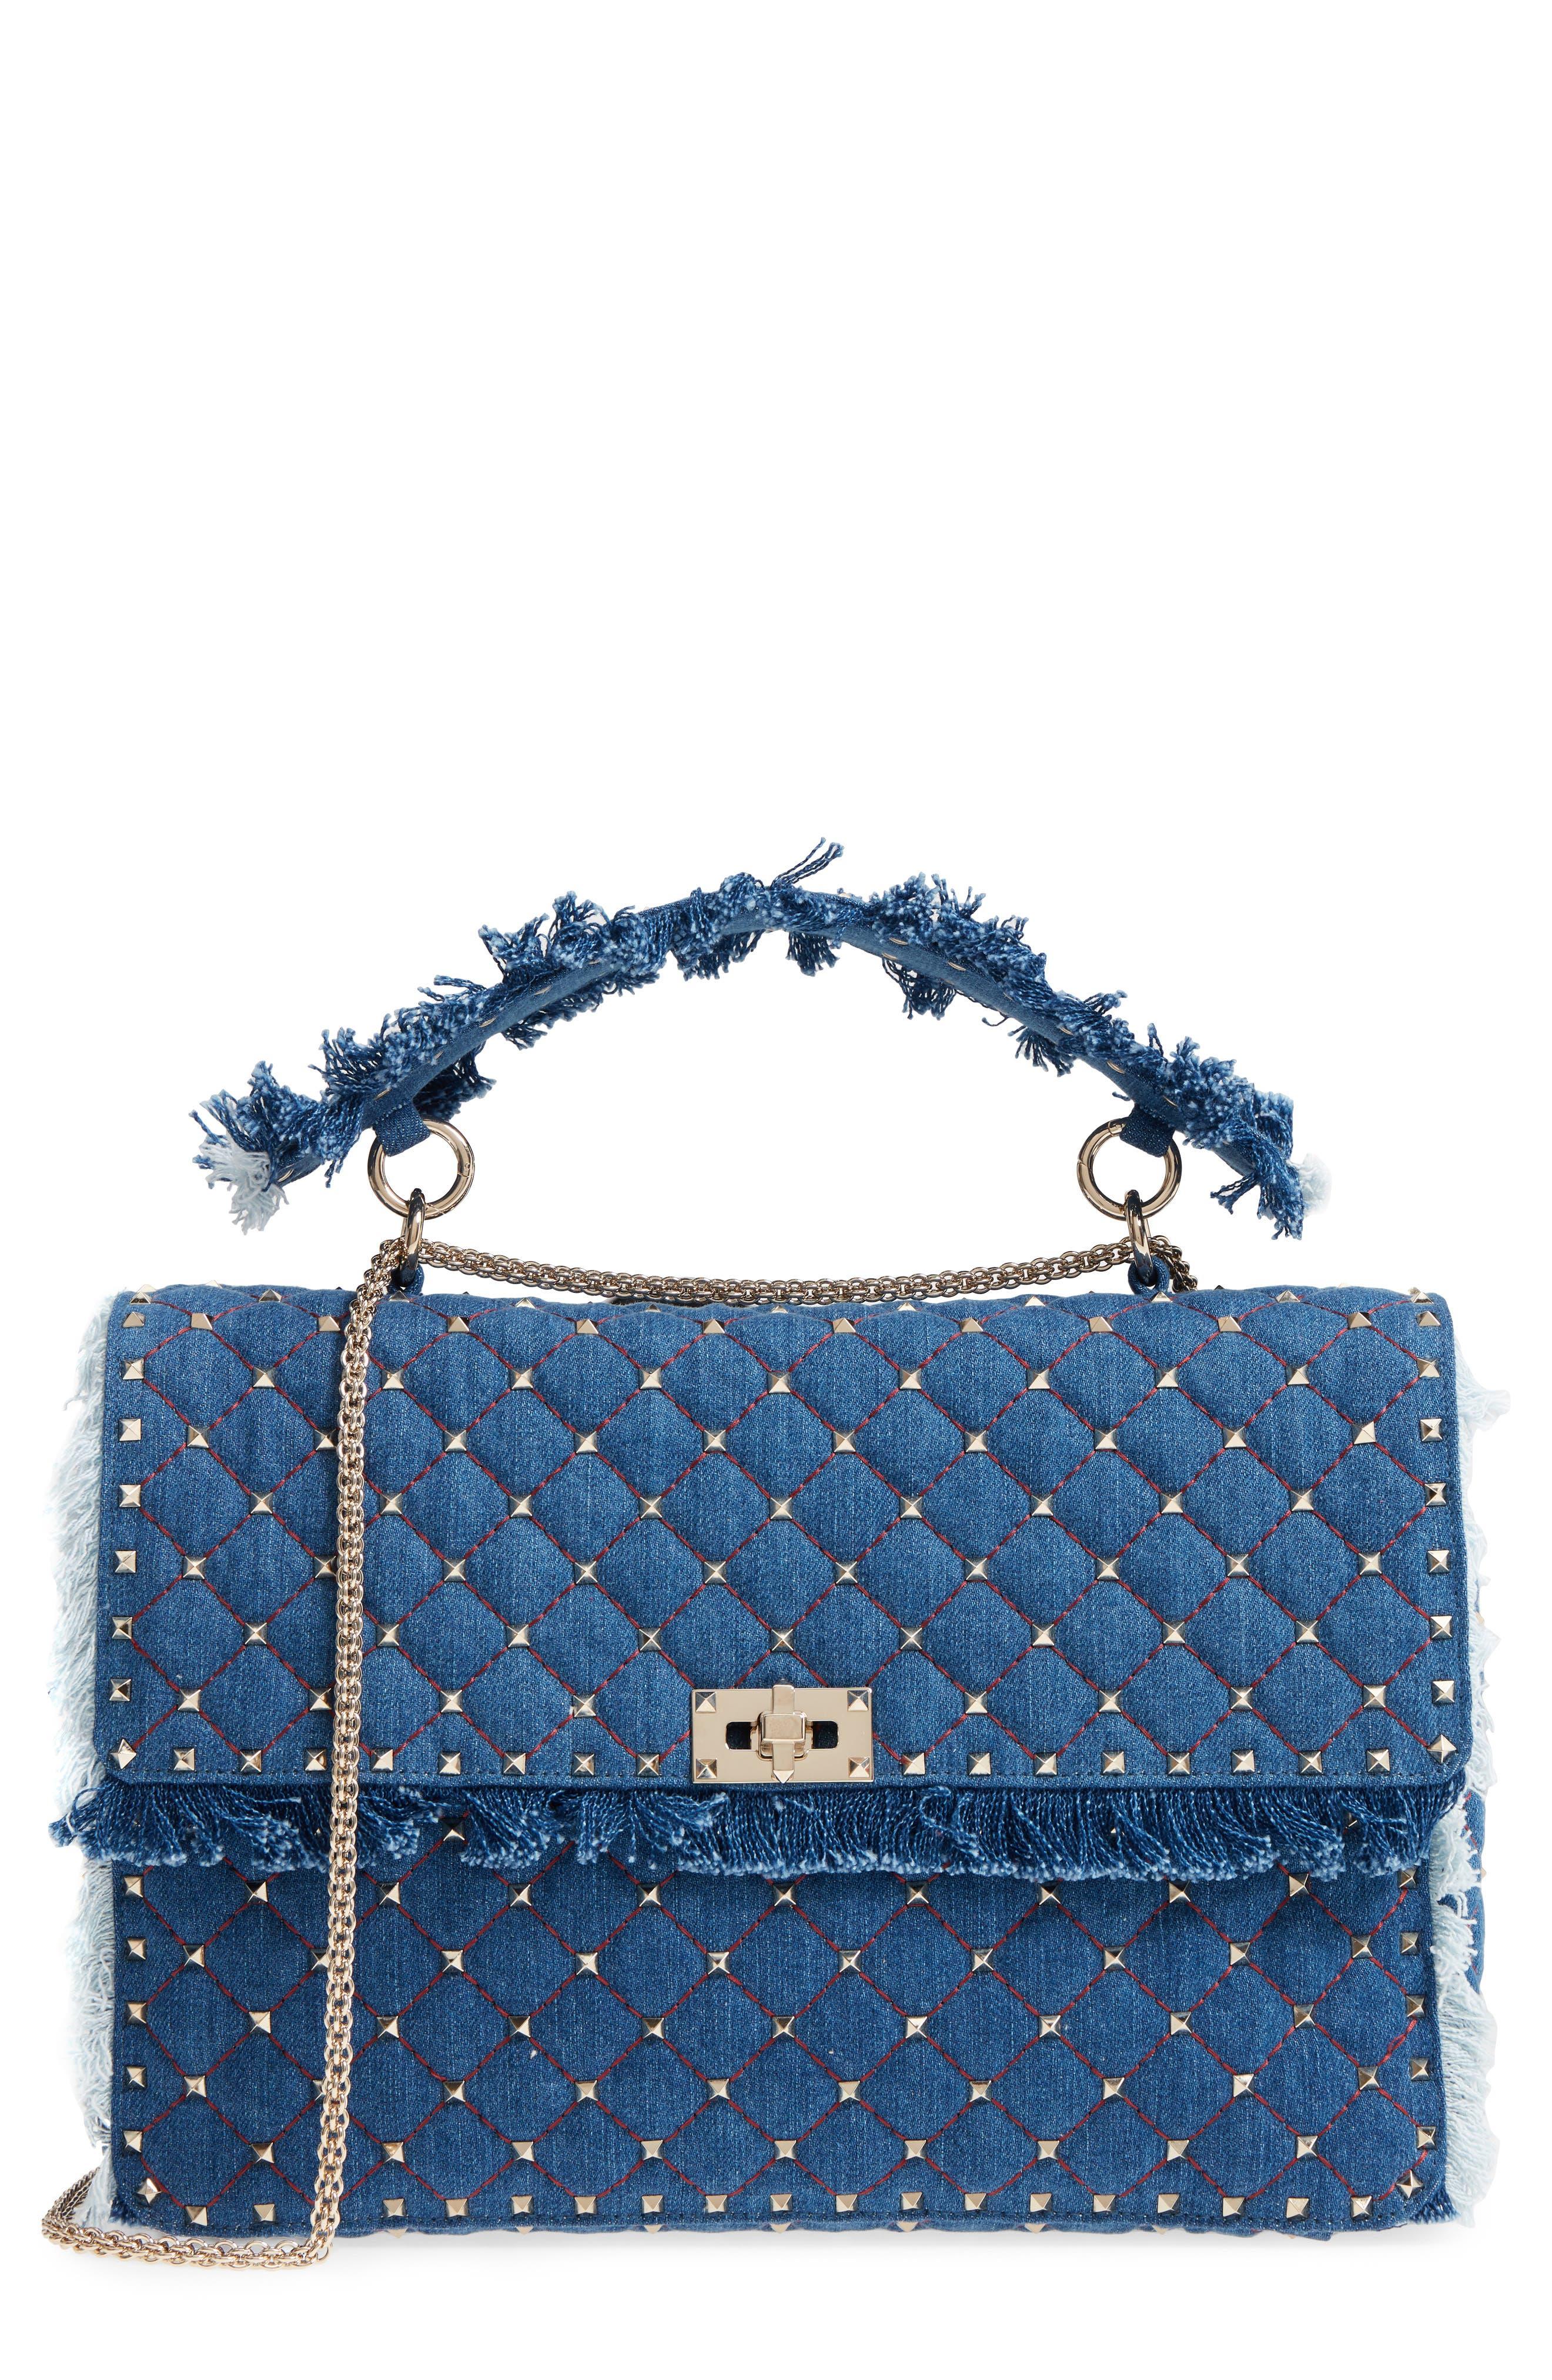 Main Image - VALENTINO GARAVANI Maxi Rockstud Spike Denim Shoulder Bag